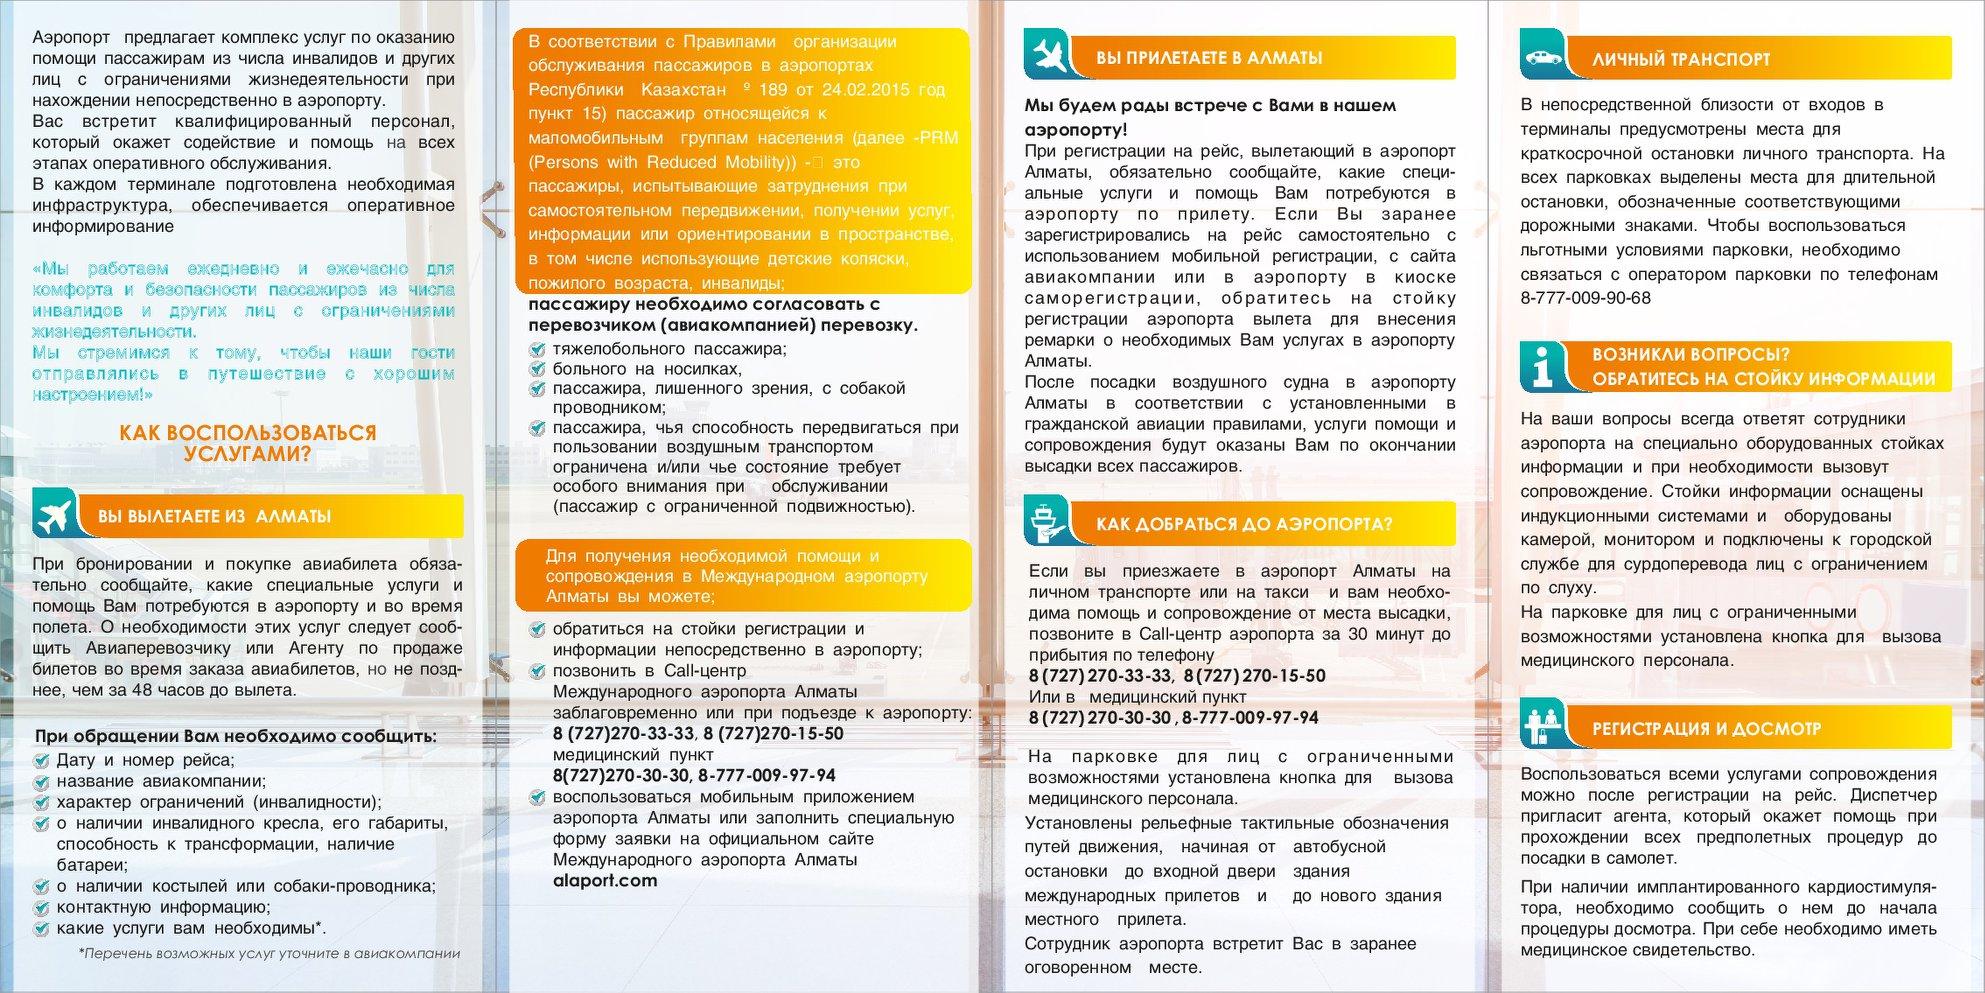 Правила в Аэропорту Алматы 2.jpg